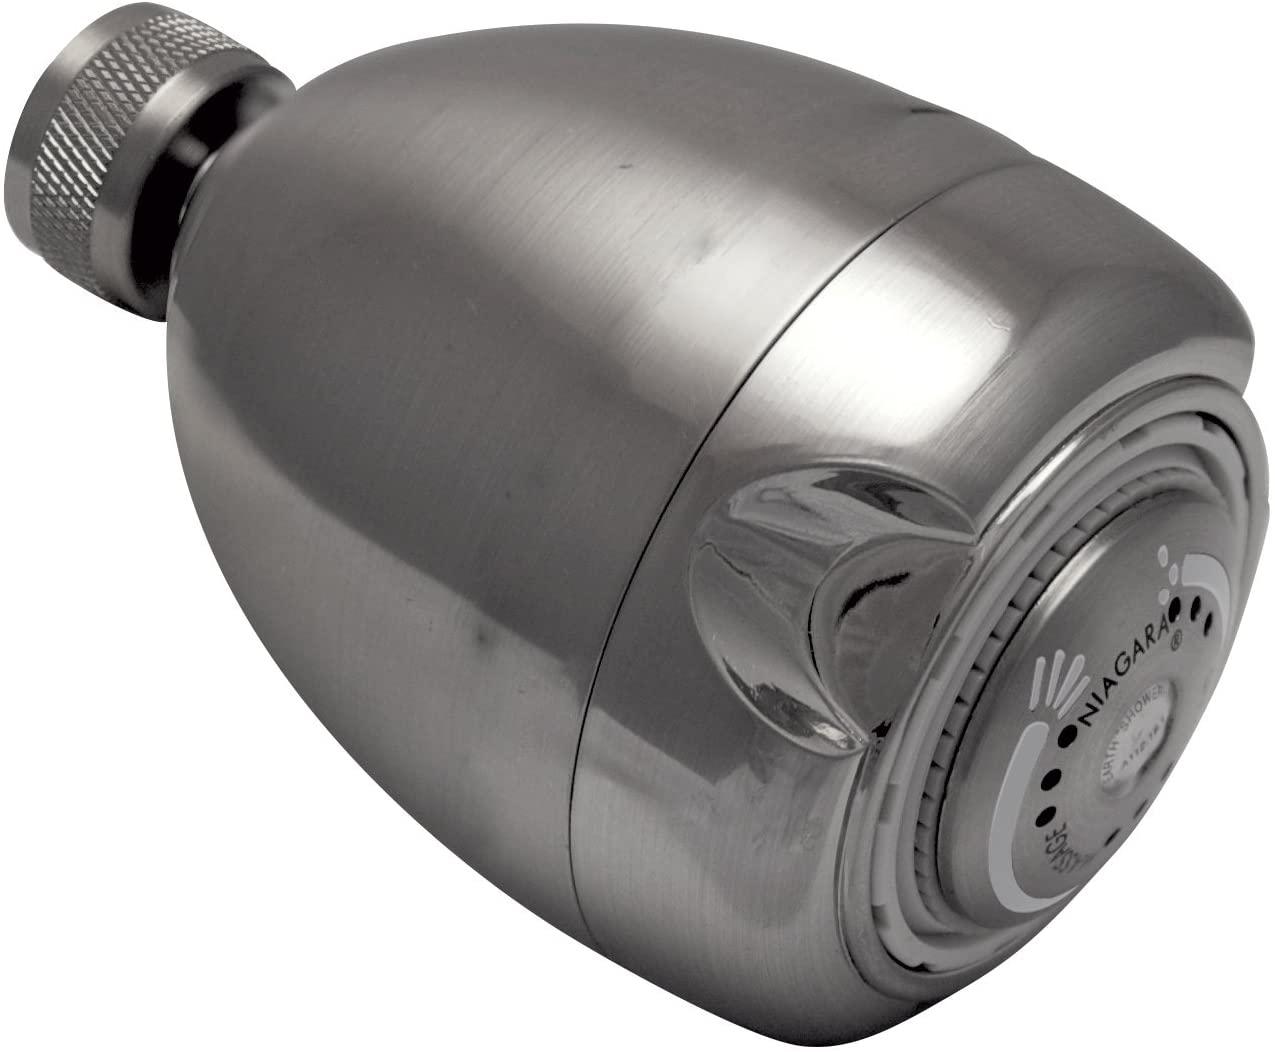 Earth Showerhead - Niagara Conservation | Energy & Water Saving Showerhead (1.5 GPM) High-Efficiency 3-Spray Brushed Nickel Fixed Shower Head (N2915BN)